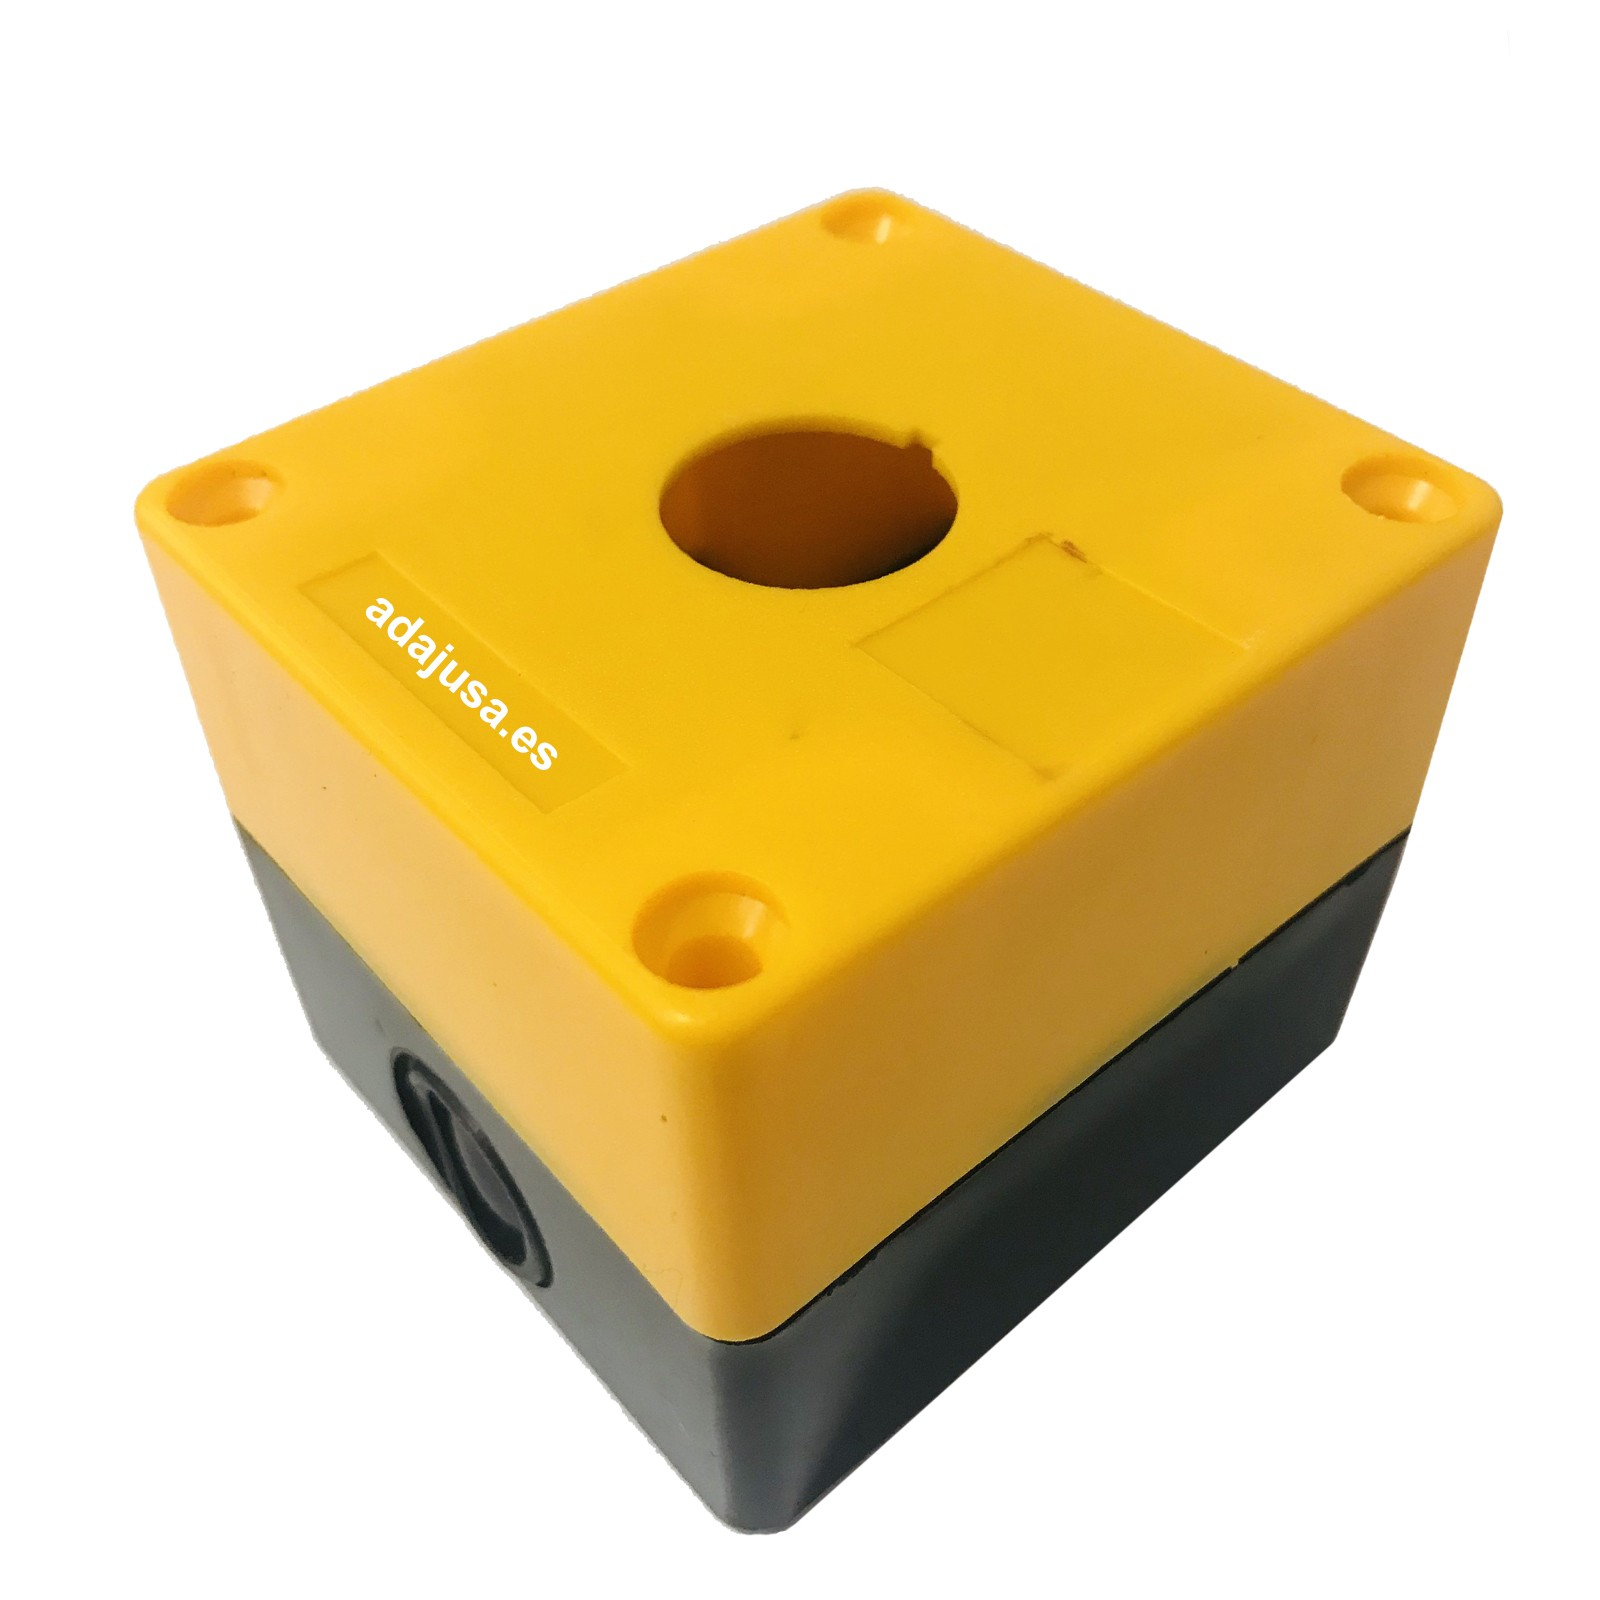 Caja botonera amarilla 1 elemento diámetro 22 plástico